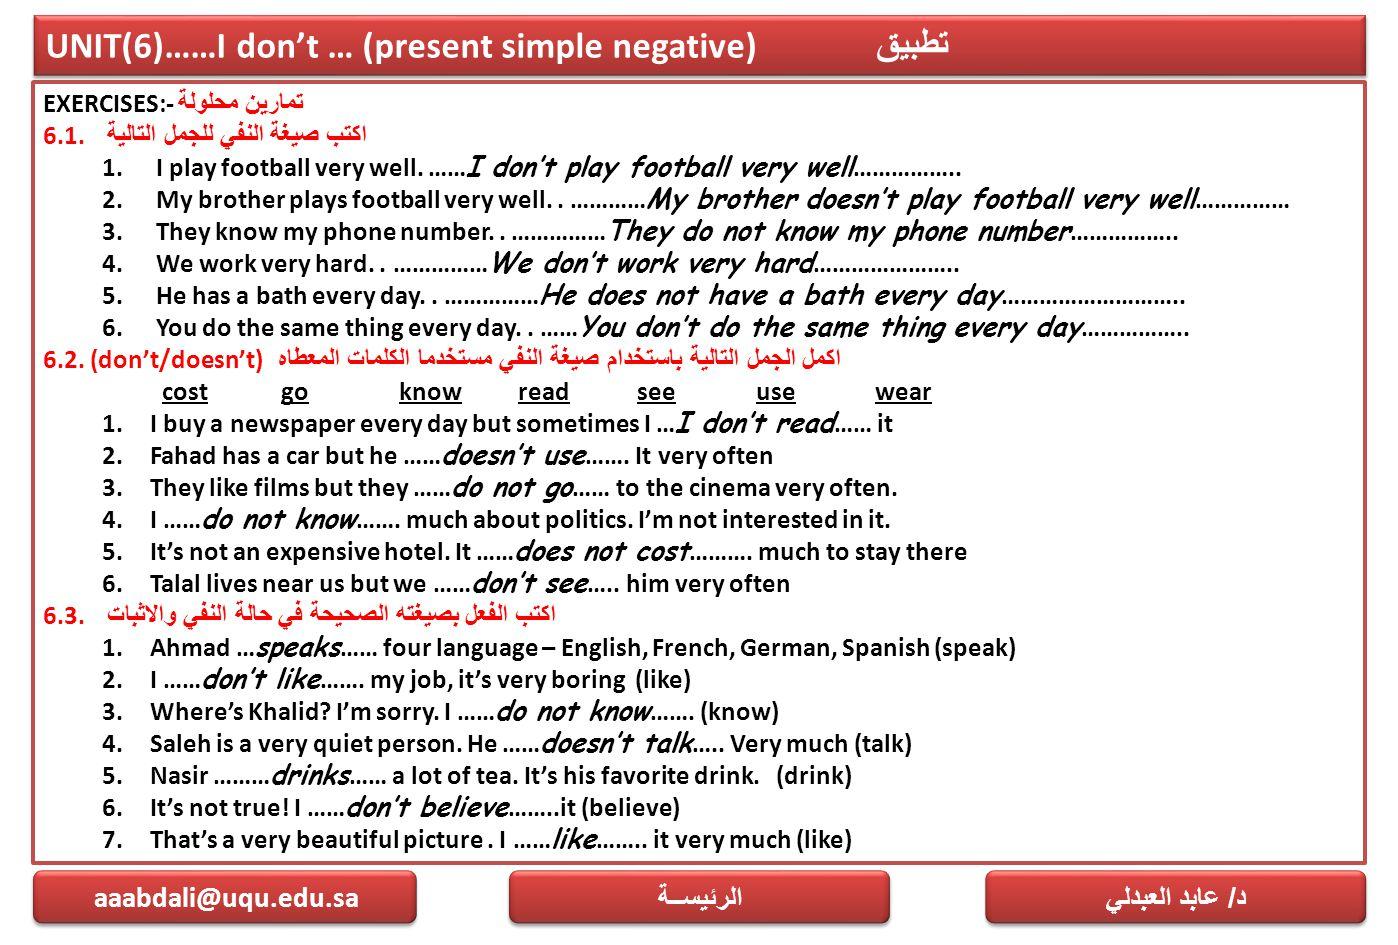 UNIT(6)……I don't … (present simple negative) تطبيق EXERCISES:- تمارين محلولة 6.1. اكتب صيغة النفي للجمل التالية 1. I play football very well. …… I don